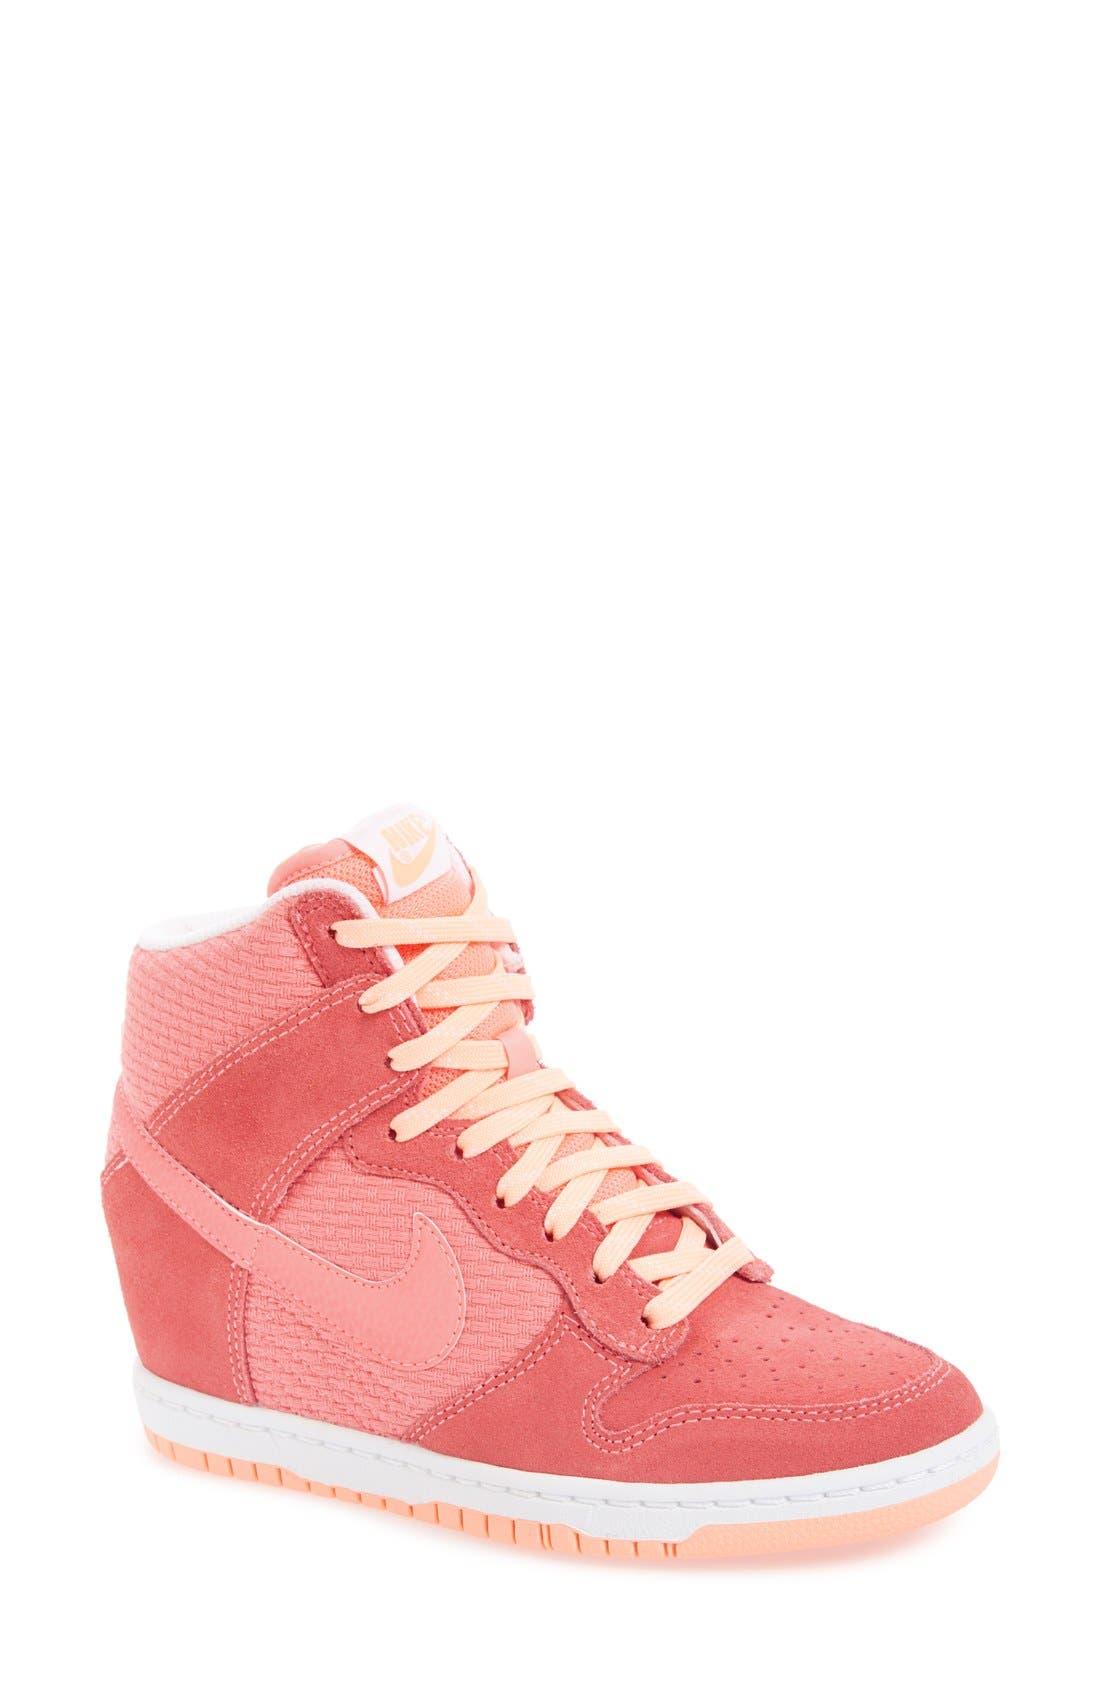 Main Image - Nike 'Dunk Sky Hi - Essential' Wedge Sneaker (Women)